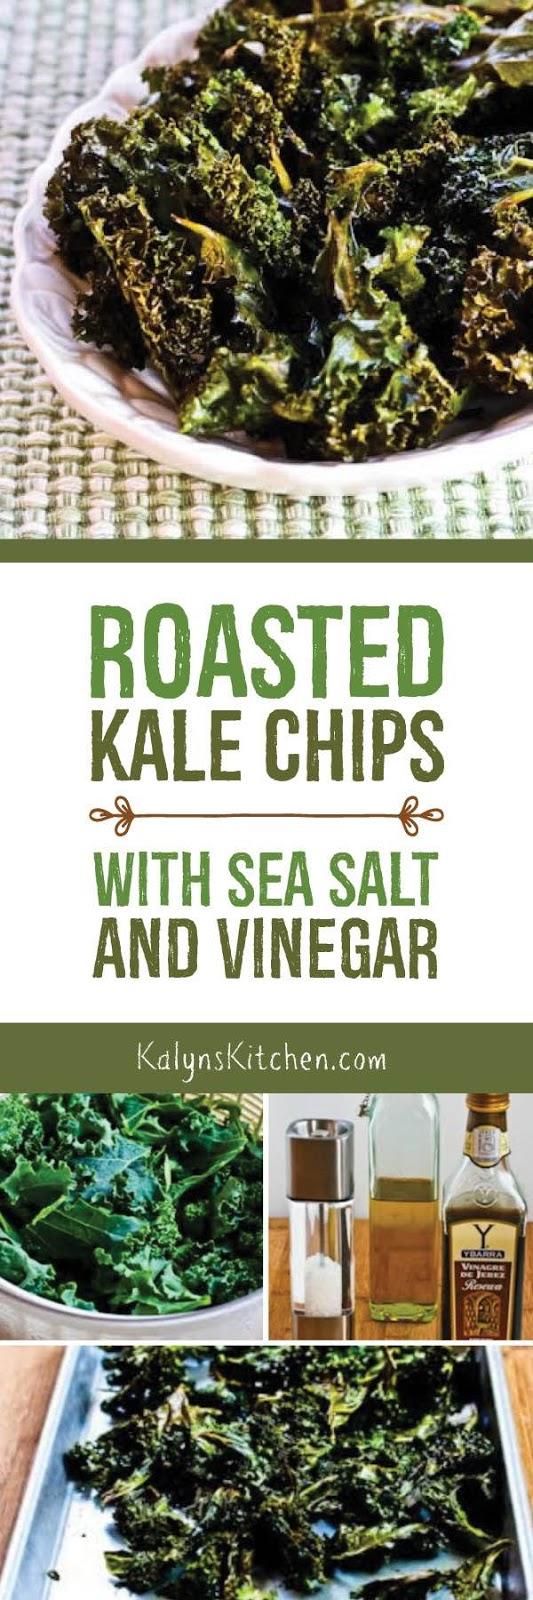 Roasted Kale Chips with Sea Salt and Vinegar found on KalynsKitchen ...